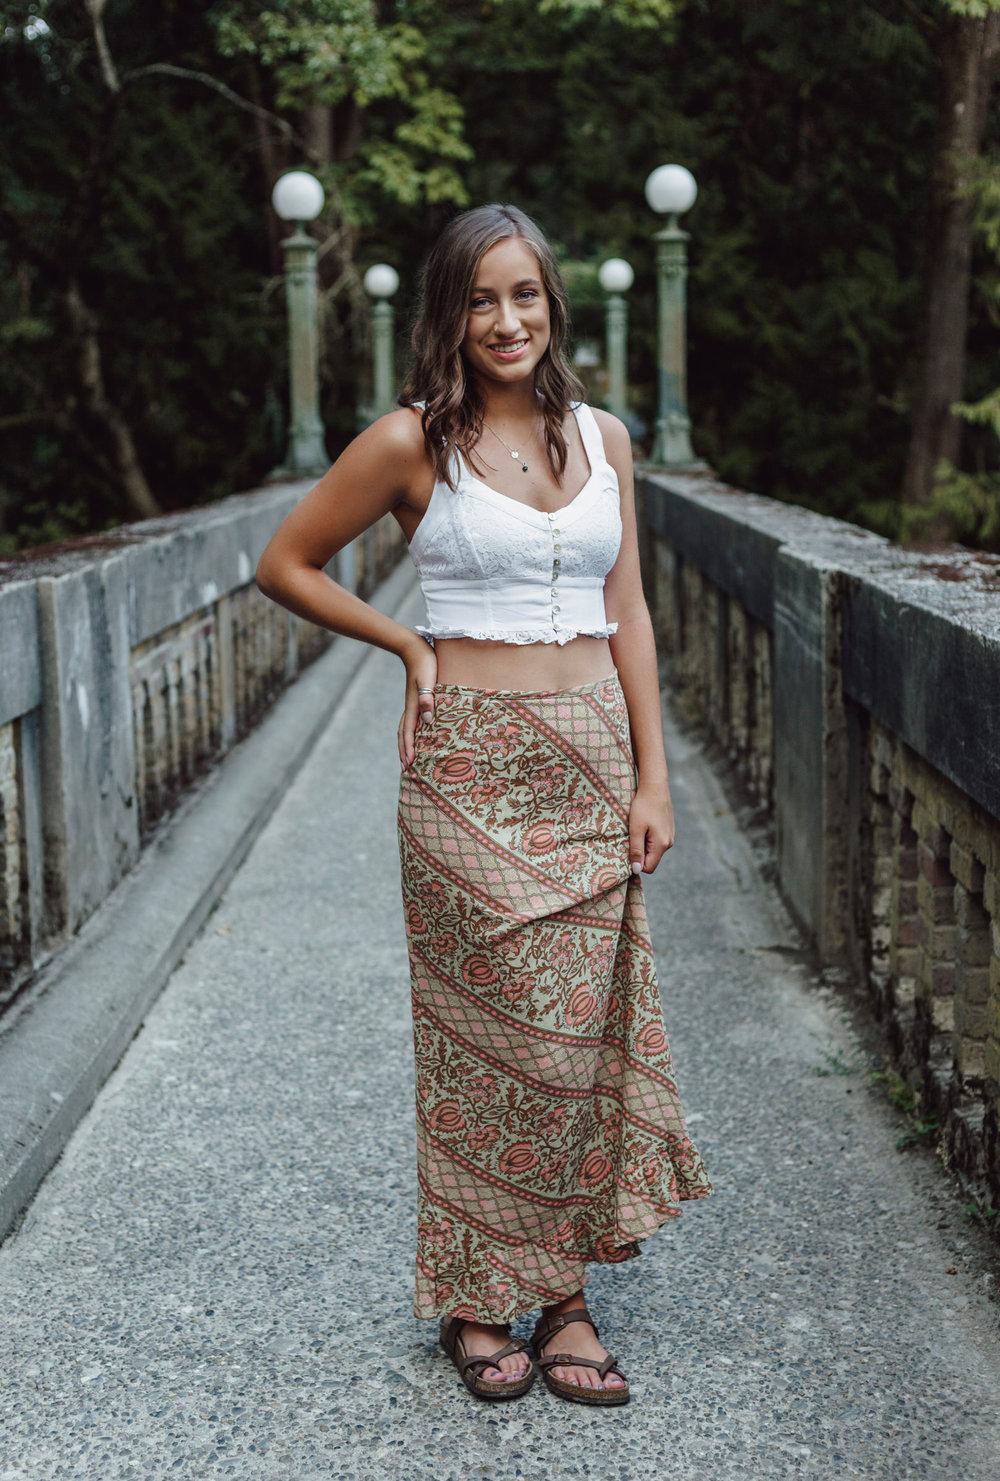 MeganSeniorPortraits-HaleyMcLainPhotography-4.JPG